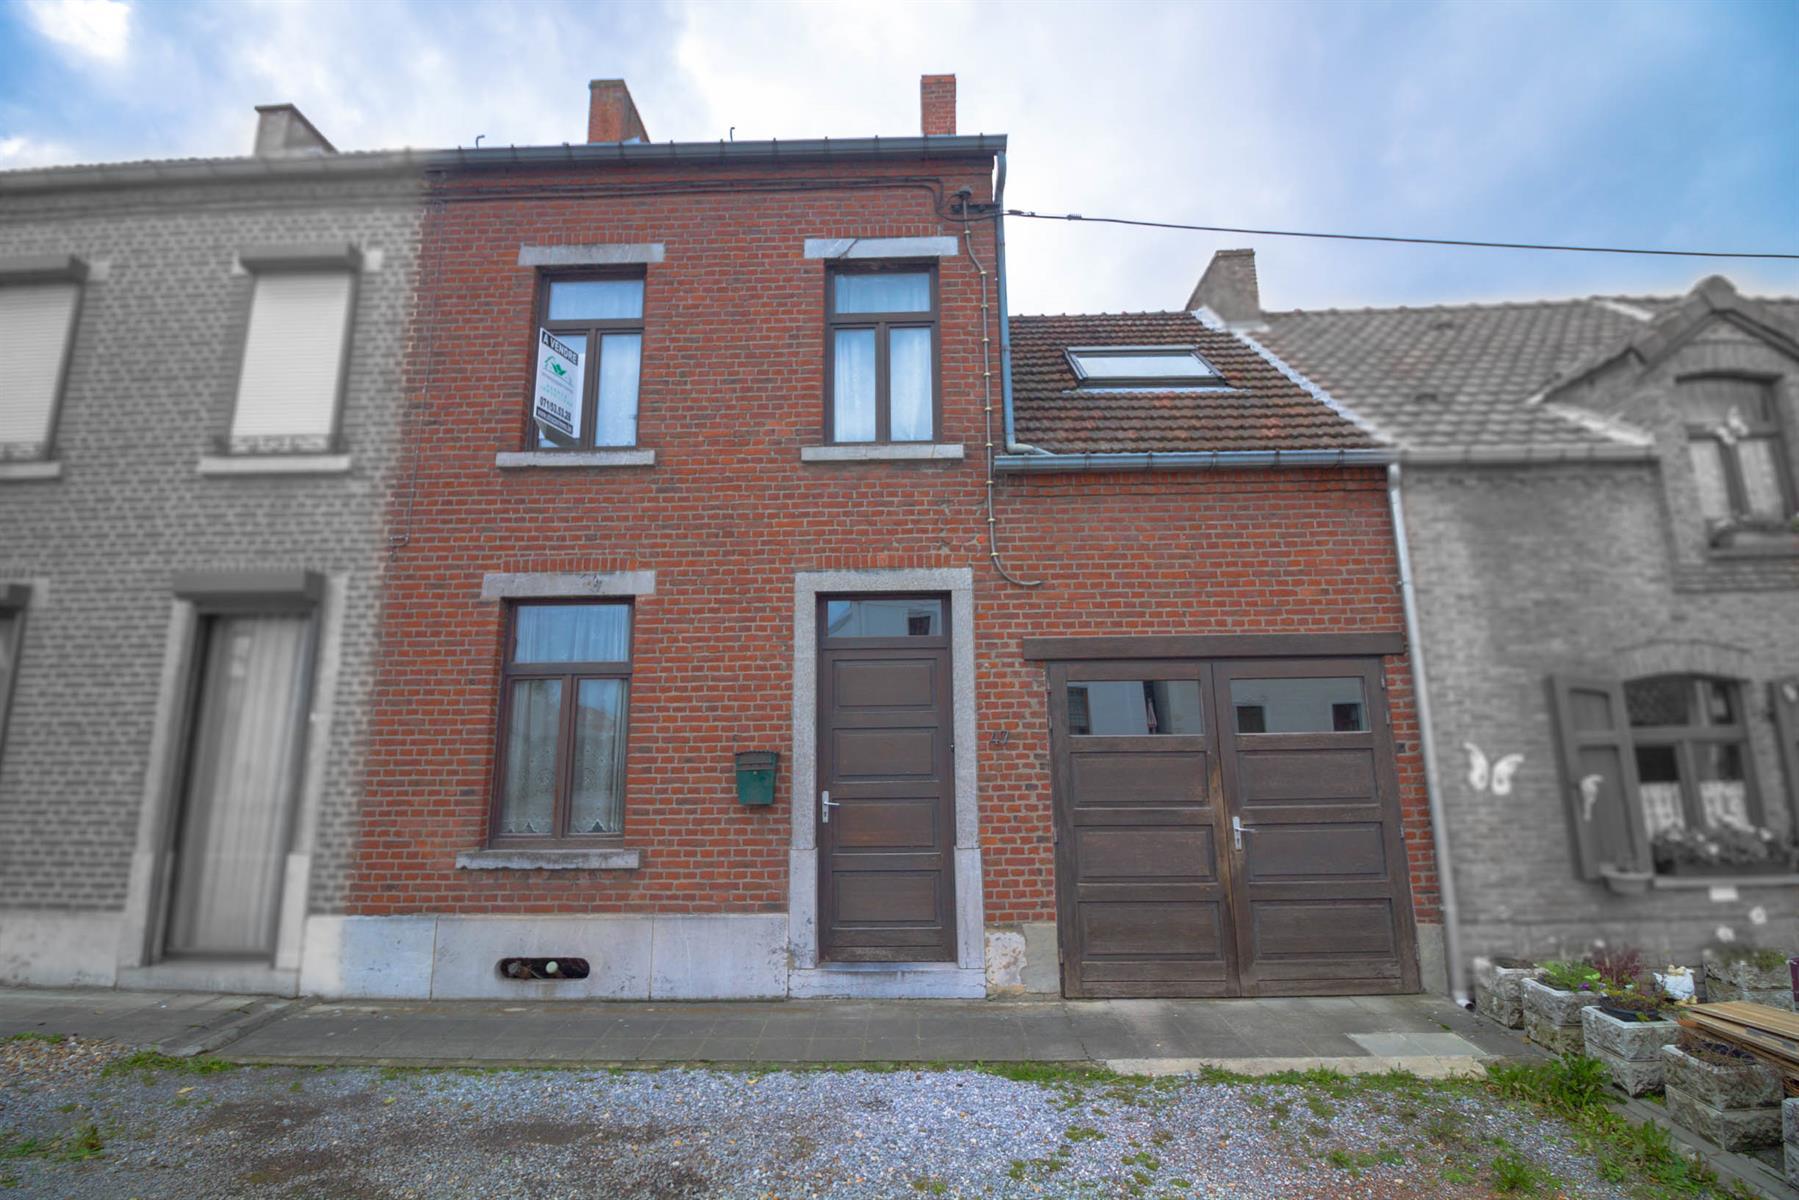 Maison - Lobbes - #4181112-0